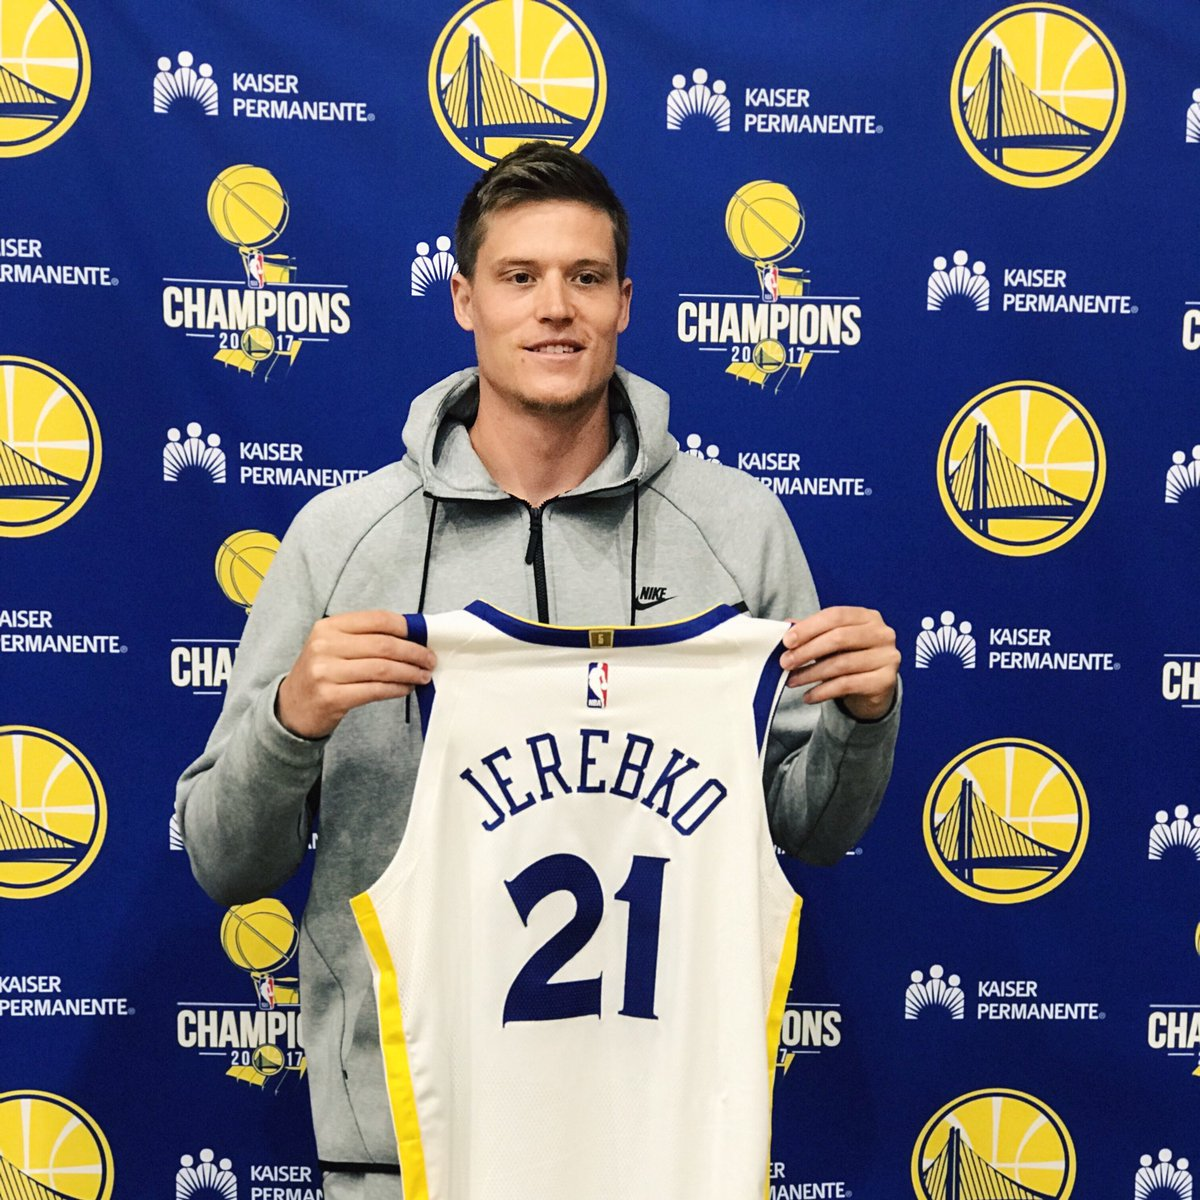 Rockets Vs Warriors Feb 23 2019: Back To Back NBA Champion Golden State Warriors 2018-19